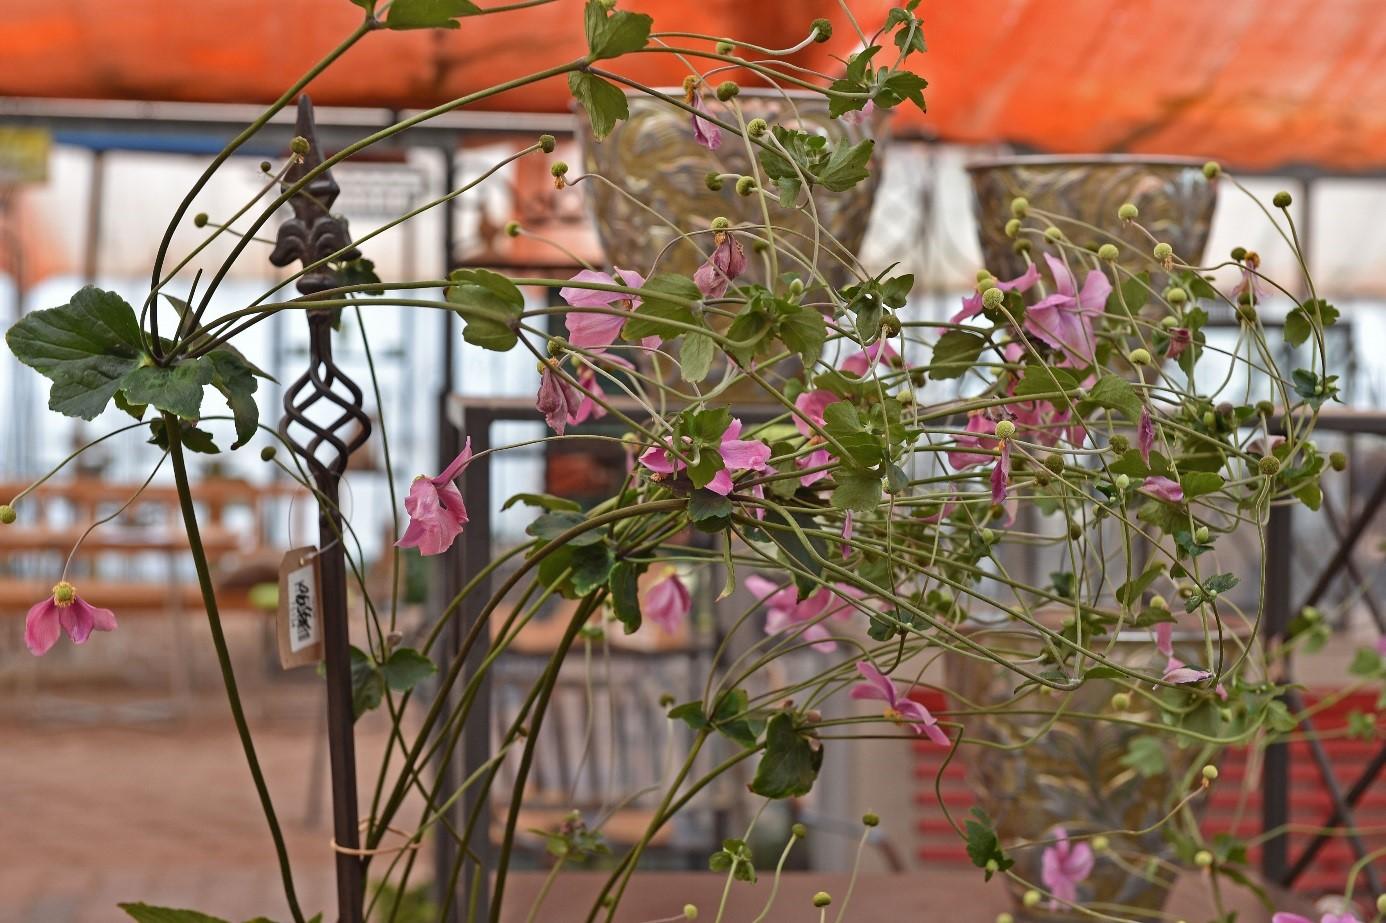 Herbst 2019 in den Historischen Rosengärten Hemmingen